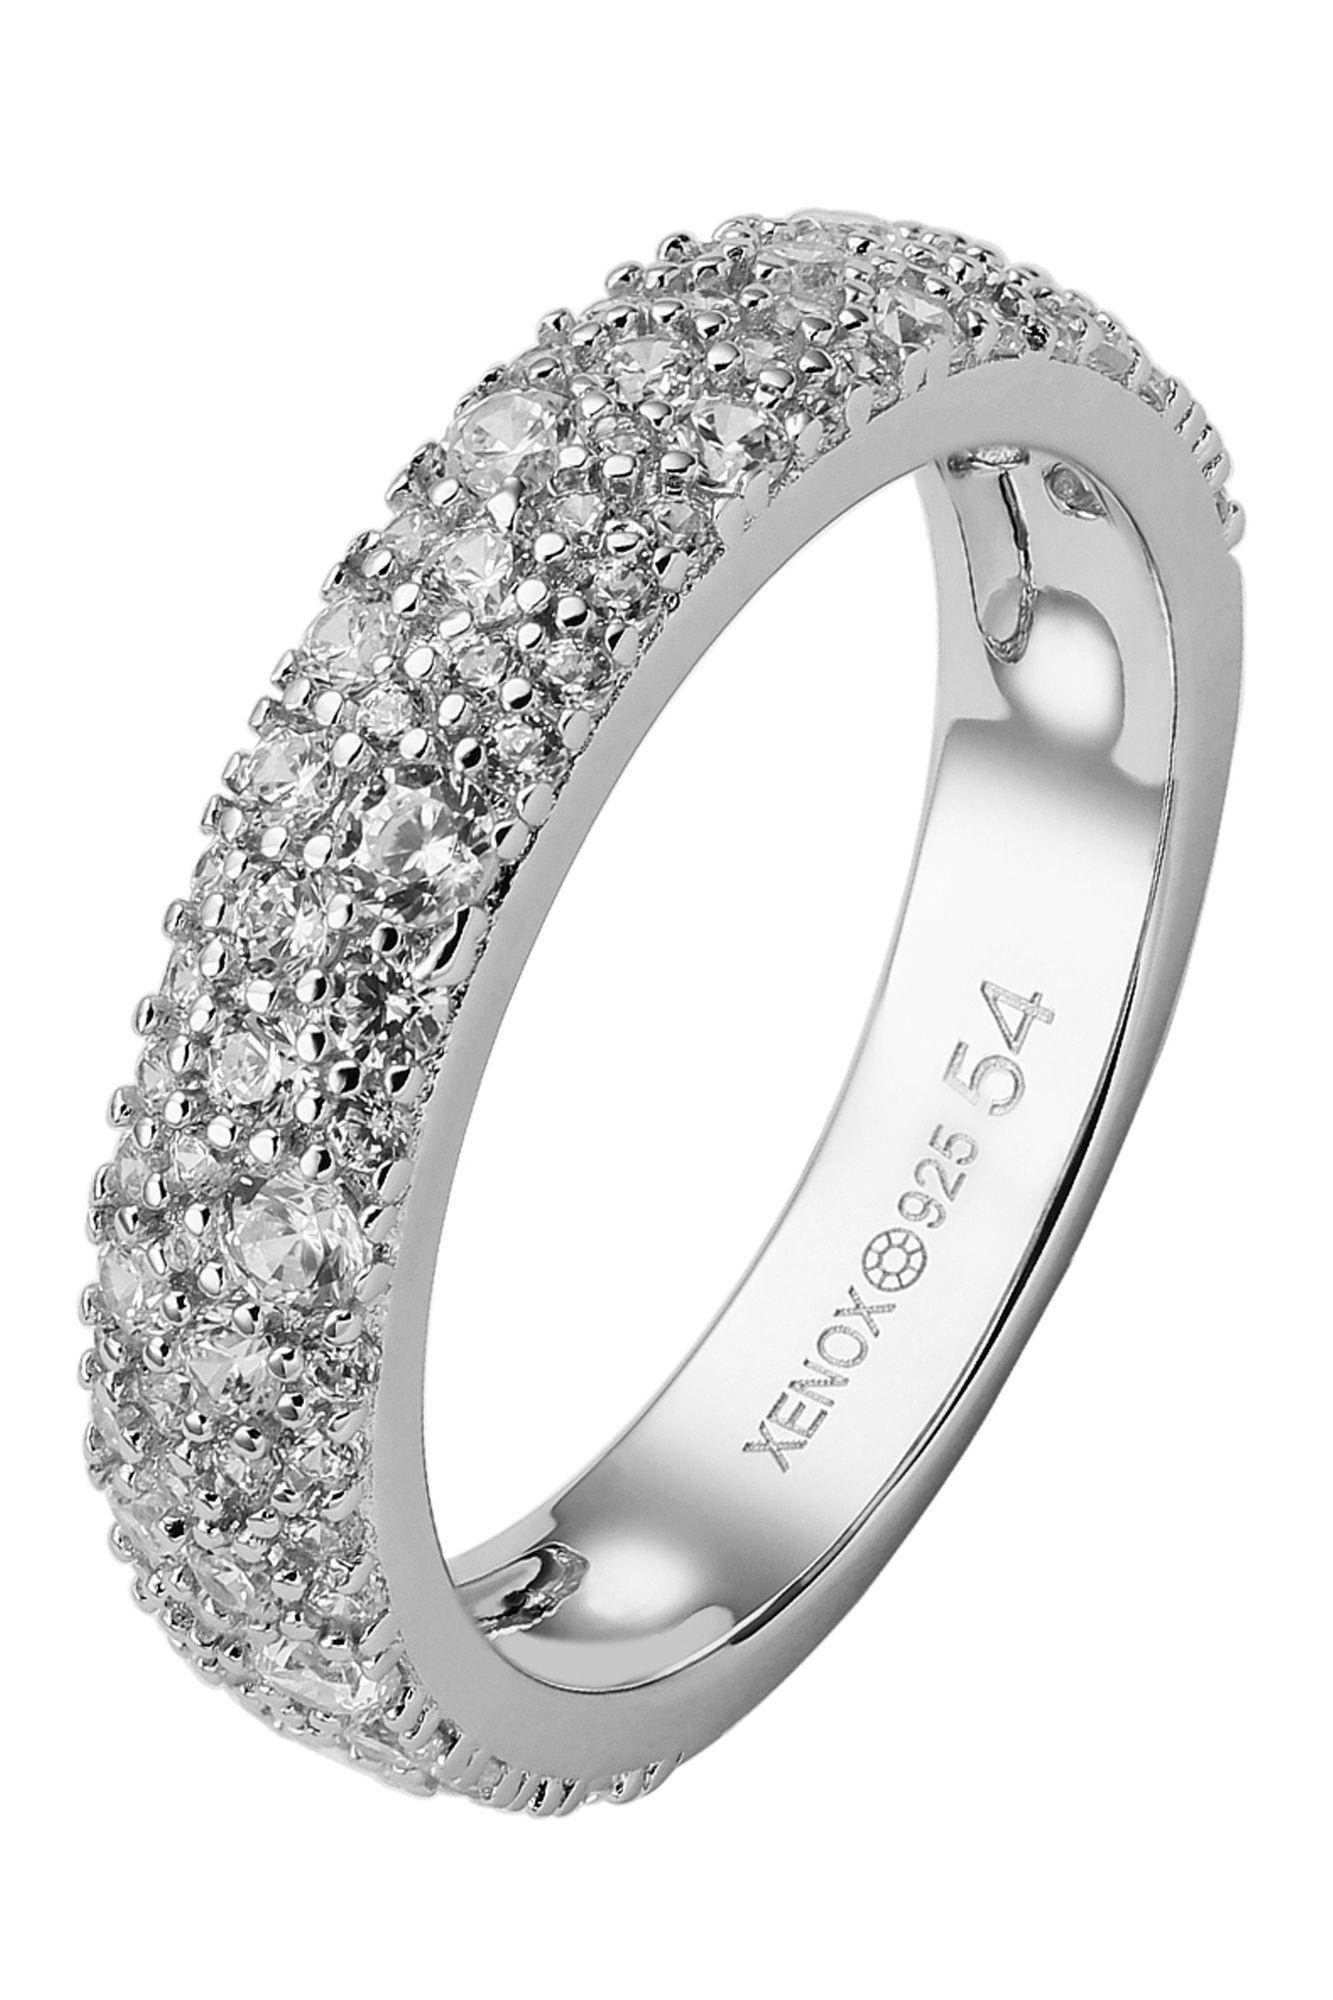 XENOX XS2029/54 Damen Ring Sterling-Silber 925 Silber weiß 54 (17.2)